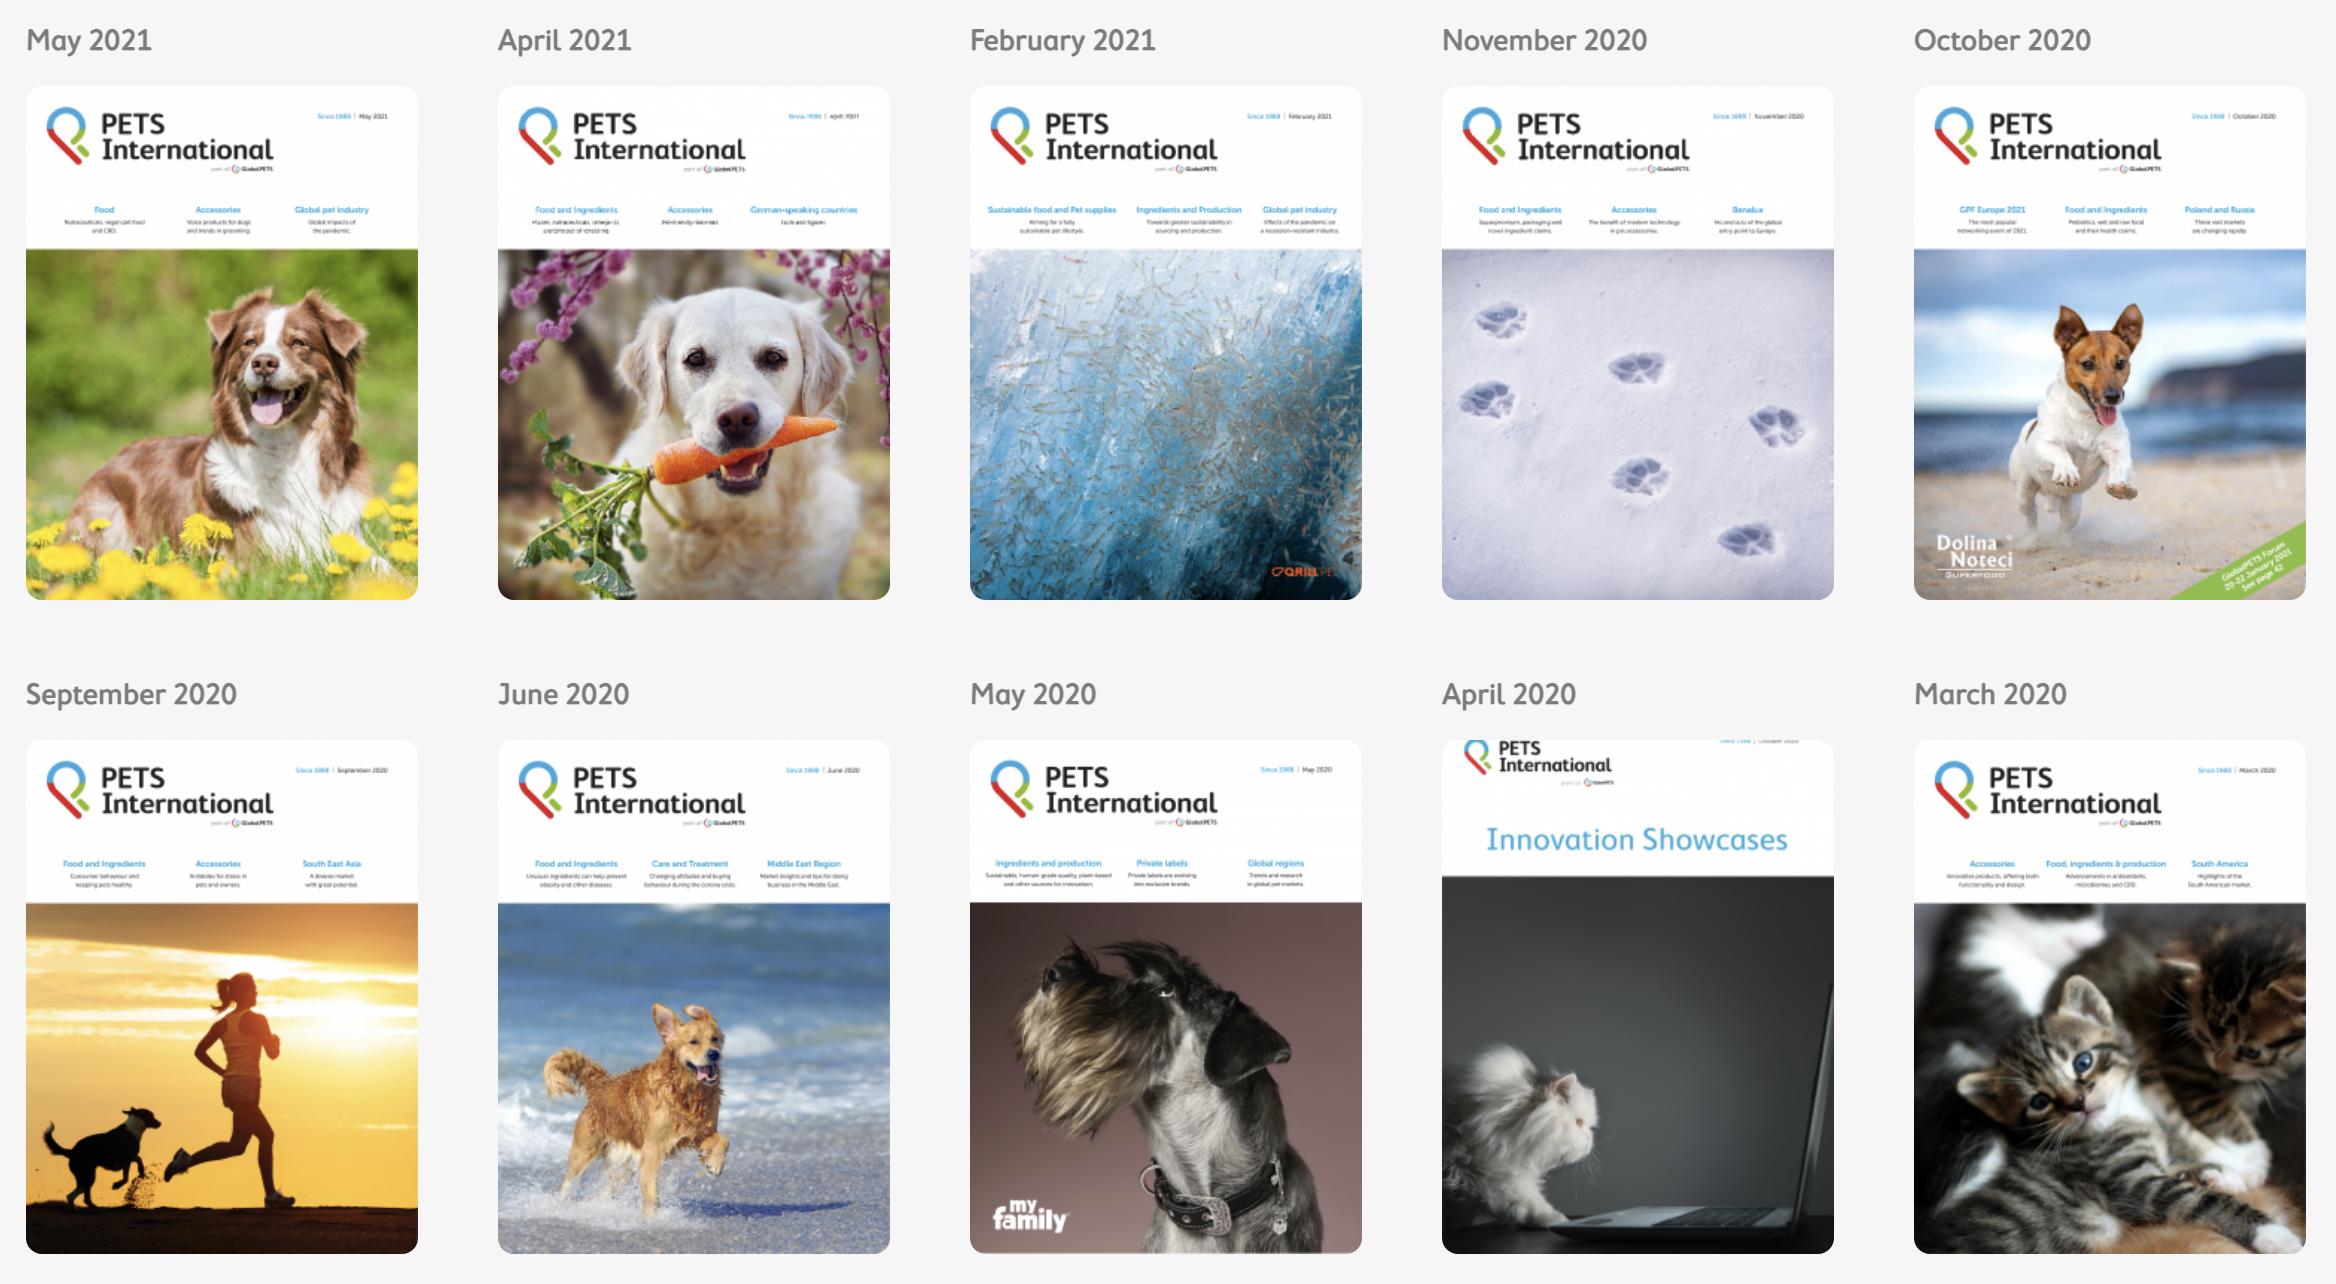 PETS International covers